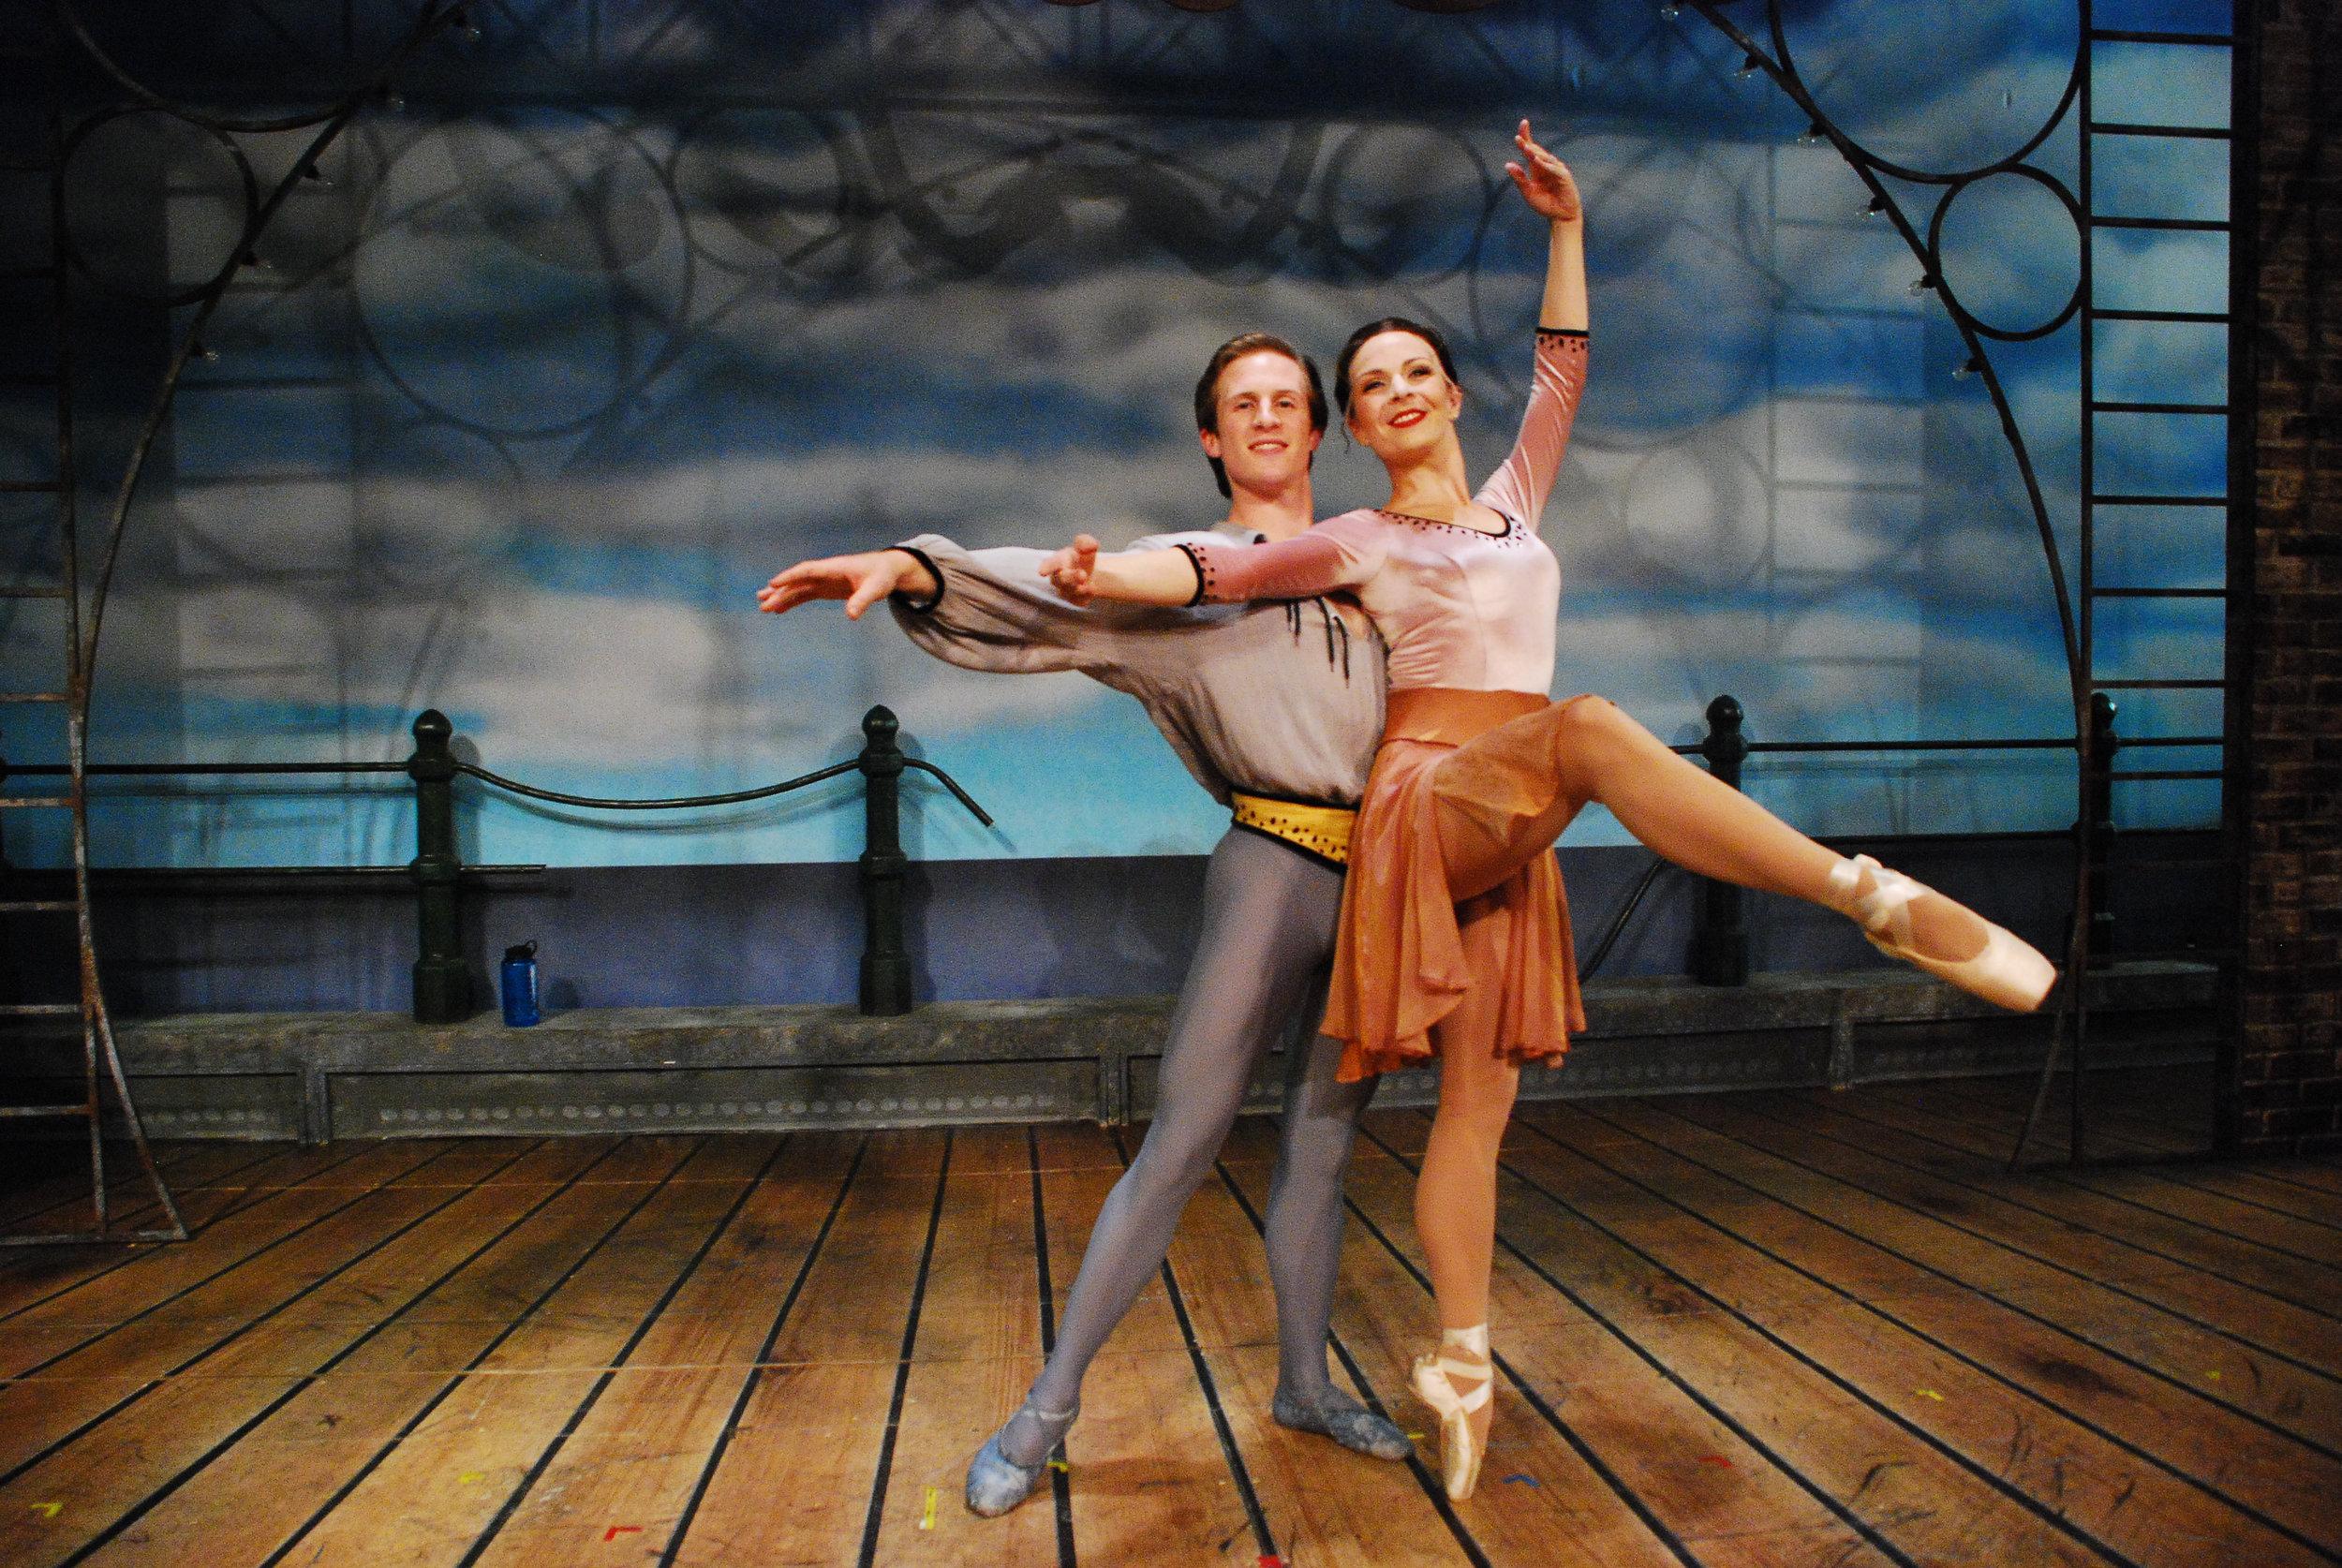 With my ballet partner, Justin Urso.